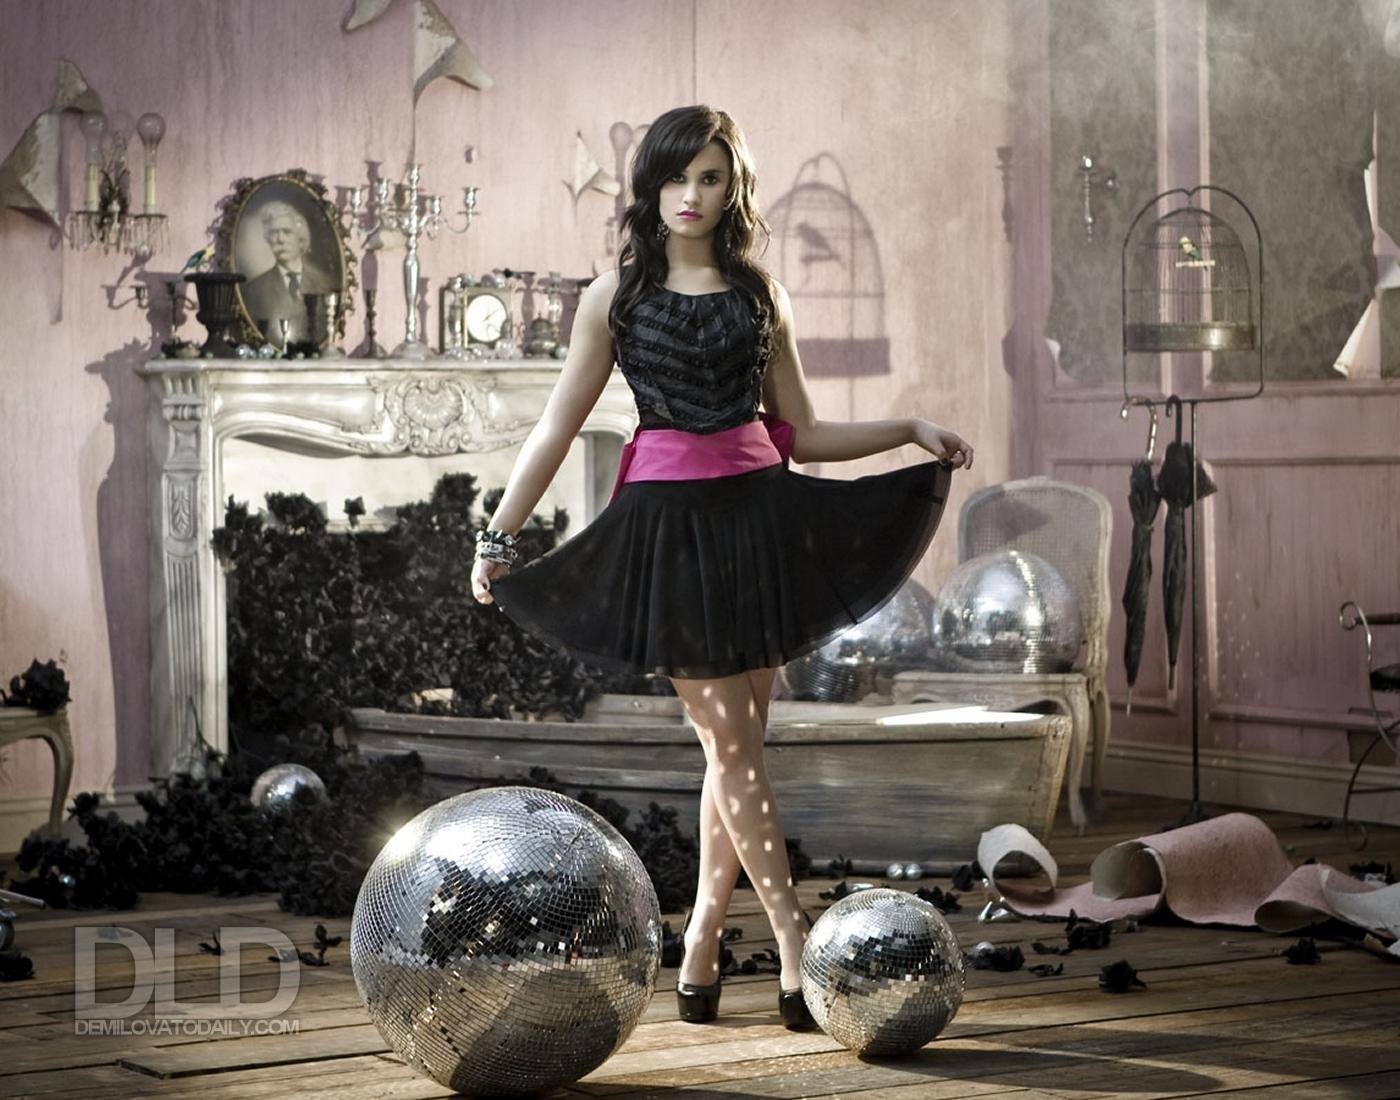 http://3.bp.blogspot.com/-d5l8-AwXops/Tf5Zz5ApmOI/AAAAAAAAAl4/LHQeftQeeUA/s1600/Demi-Lovato-Wallpaper-demi-lovato-8239479-1400-1100.jpg